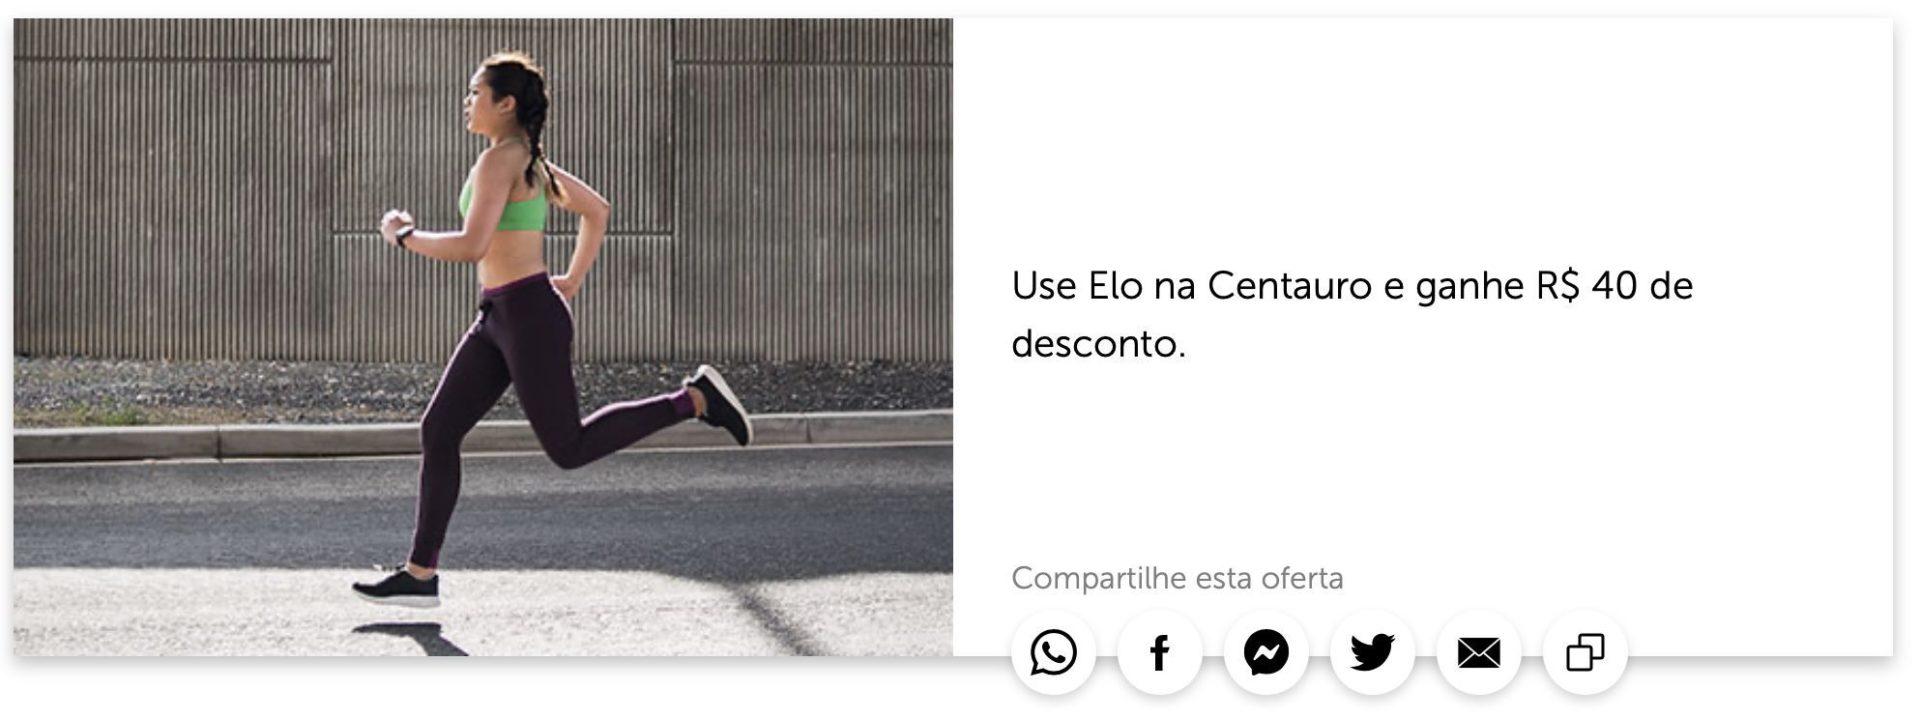 Elo Centauro R$40